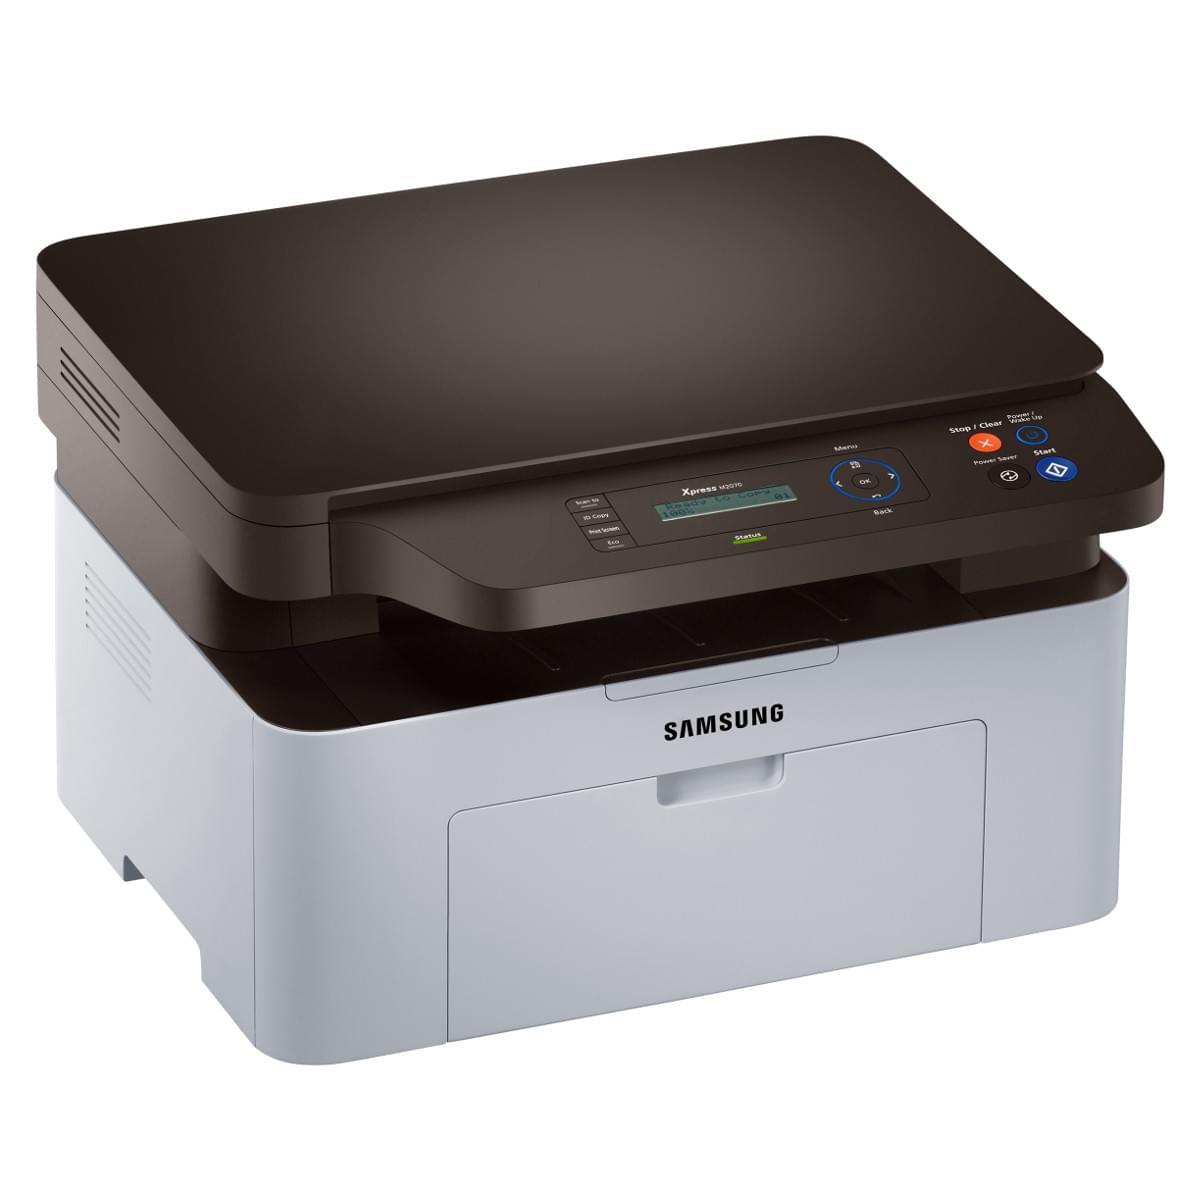 Samsung SL-M2070 (SL-M2070/SEE) - Achat / Vente Imprimante Multifonction sur Cybertek.fr - 0